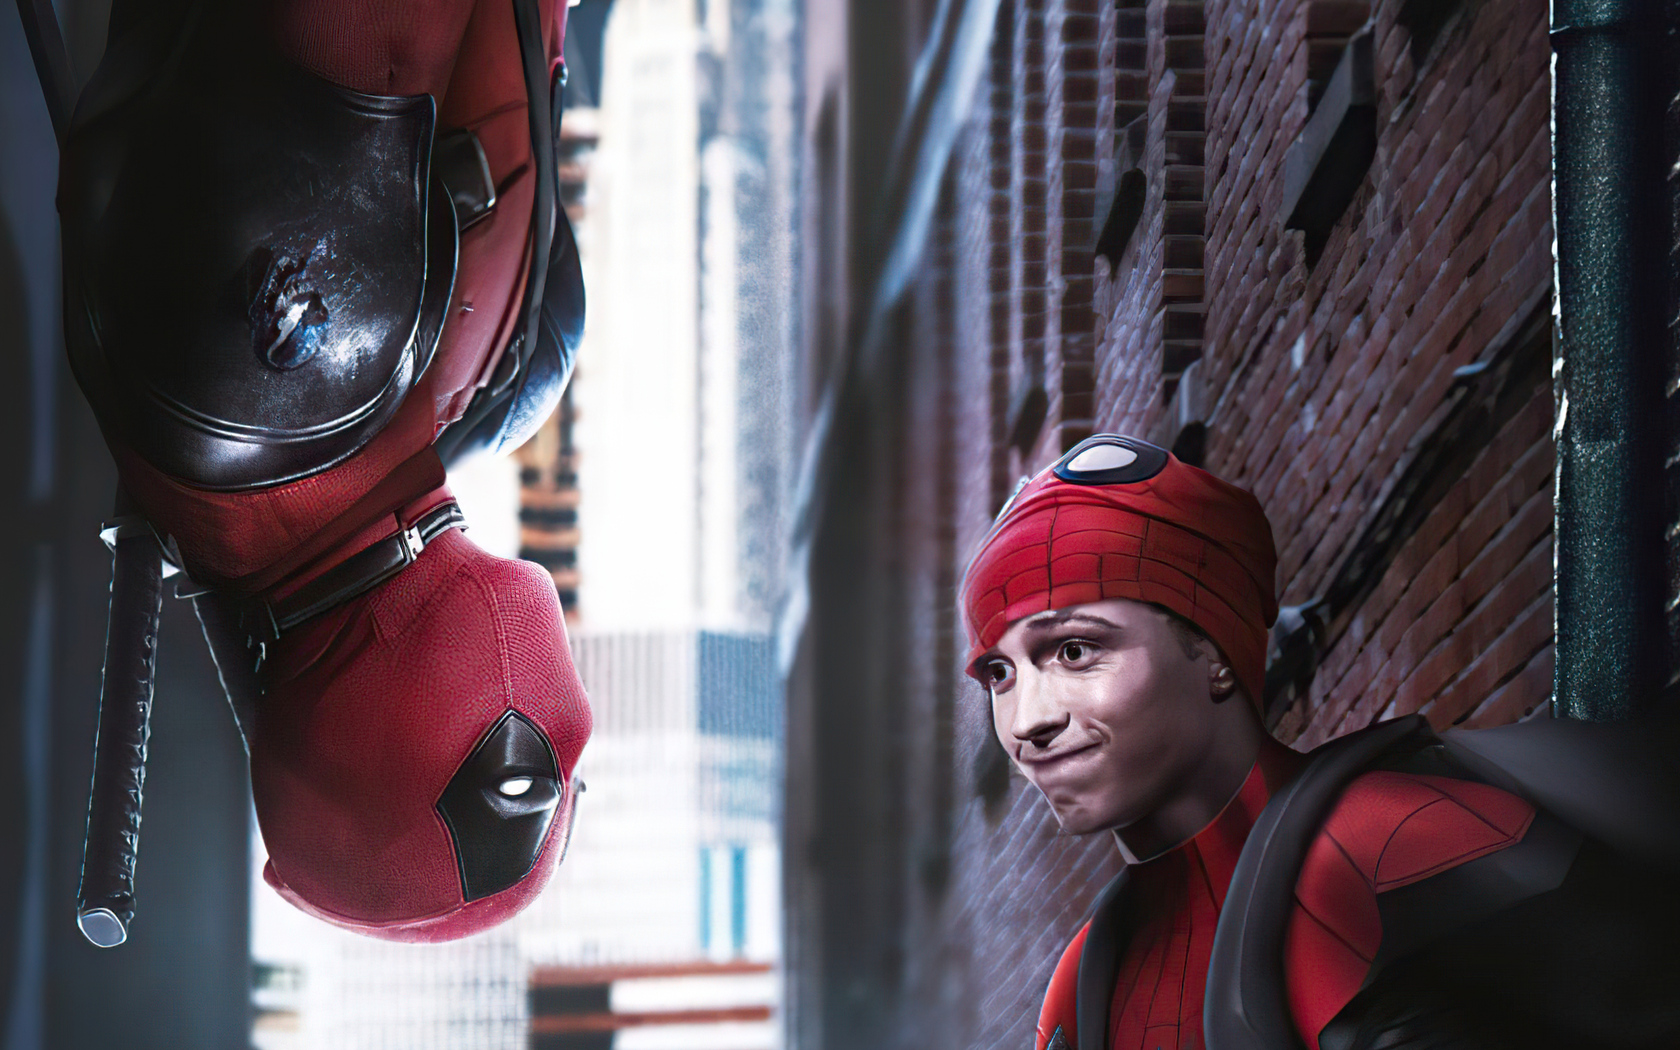 deadpool-and-spiderman-4k-xz.jpg